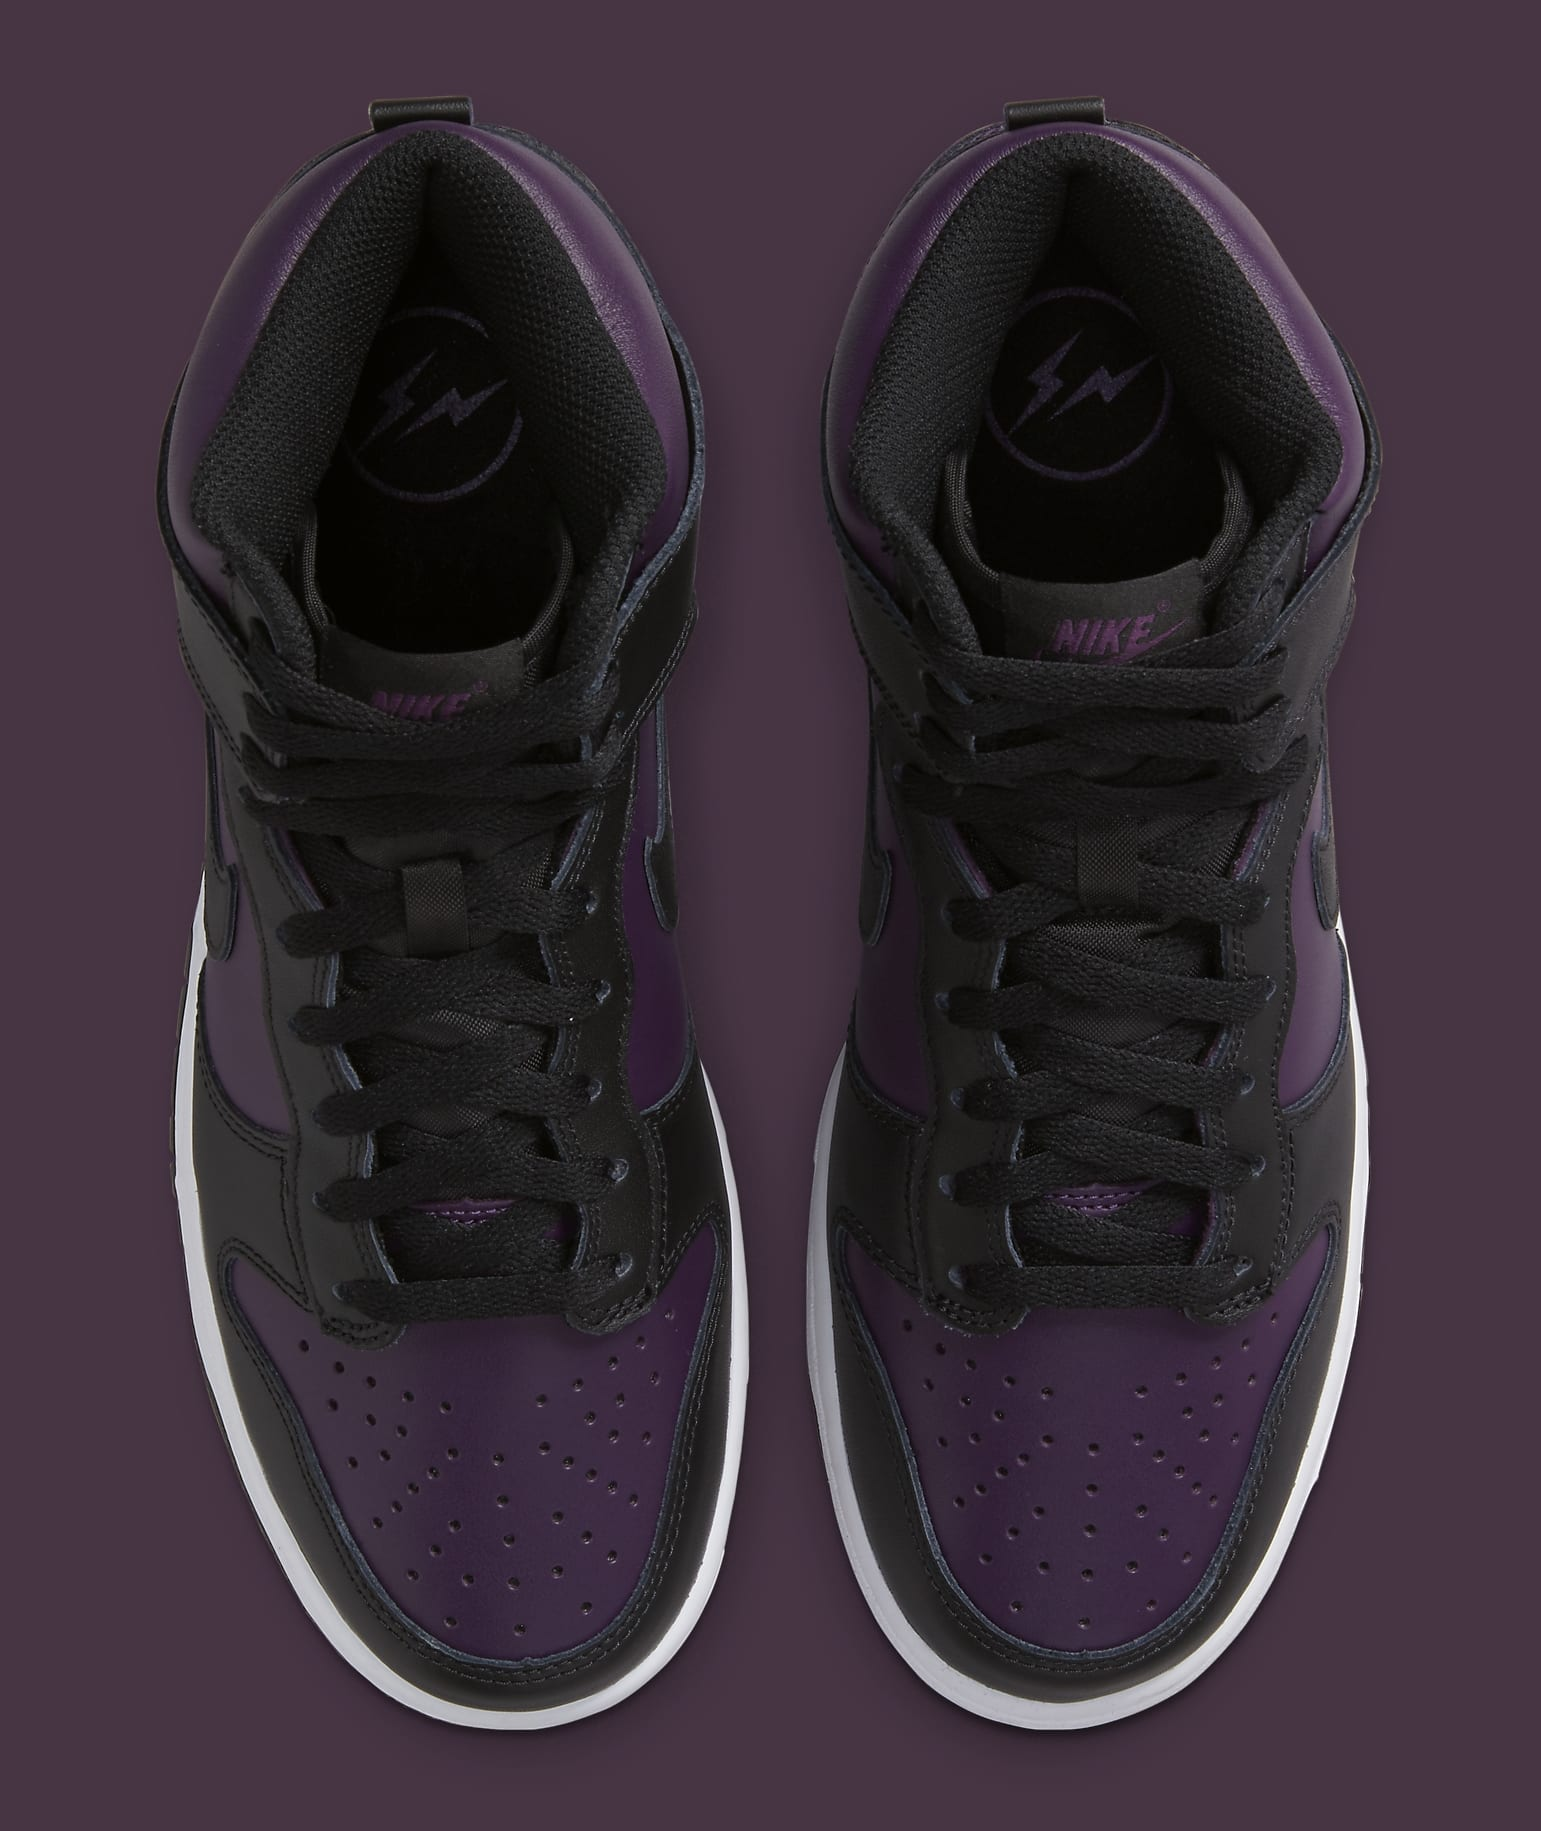 Fragment Design x Nike Dunk High 'Black' DJ0382-600 Top